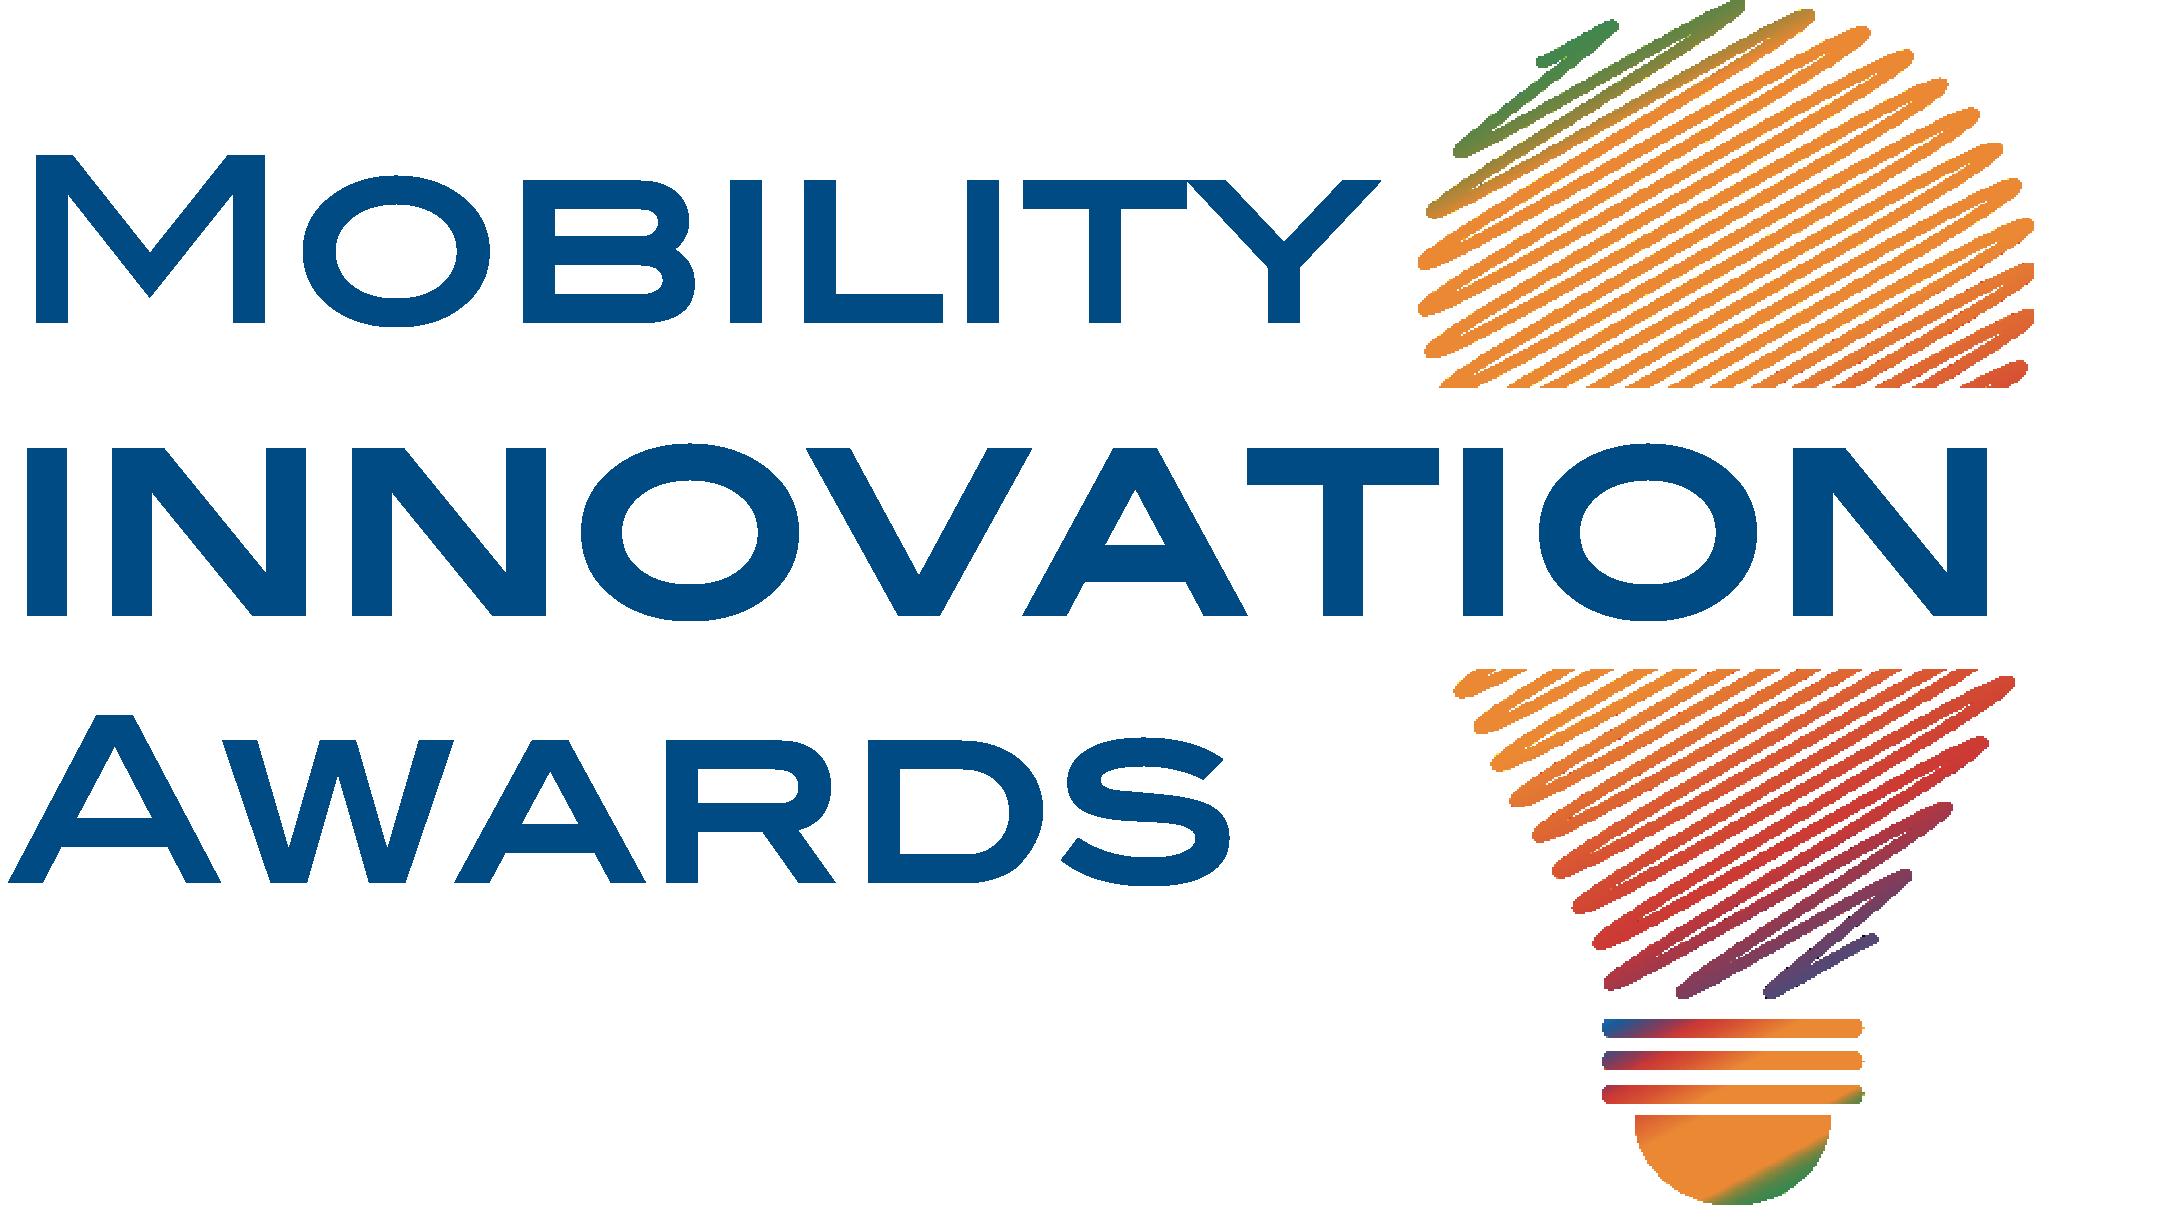 Mobility innovation logo